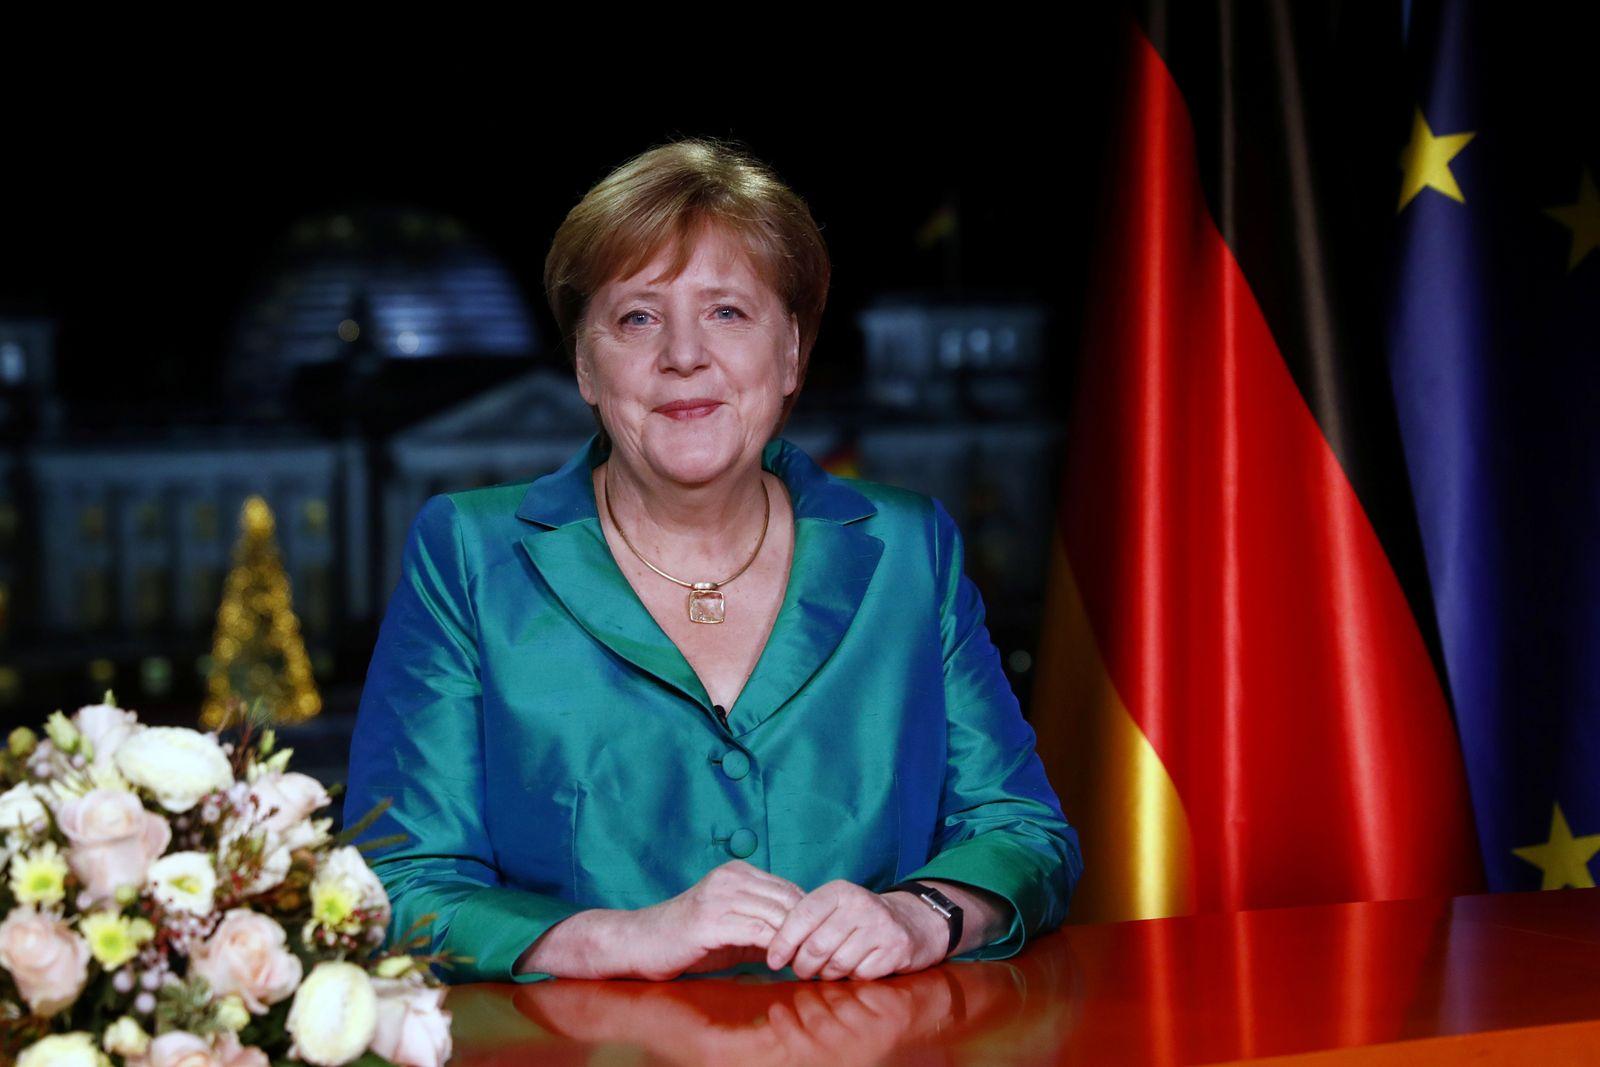 Merkel / Merkel Neujahrsansprache